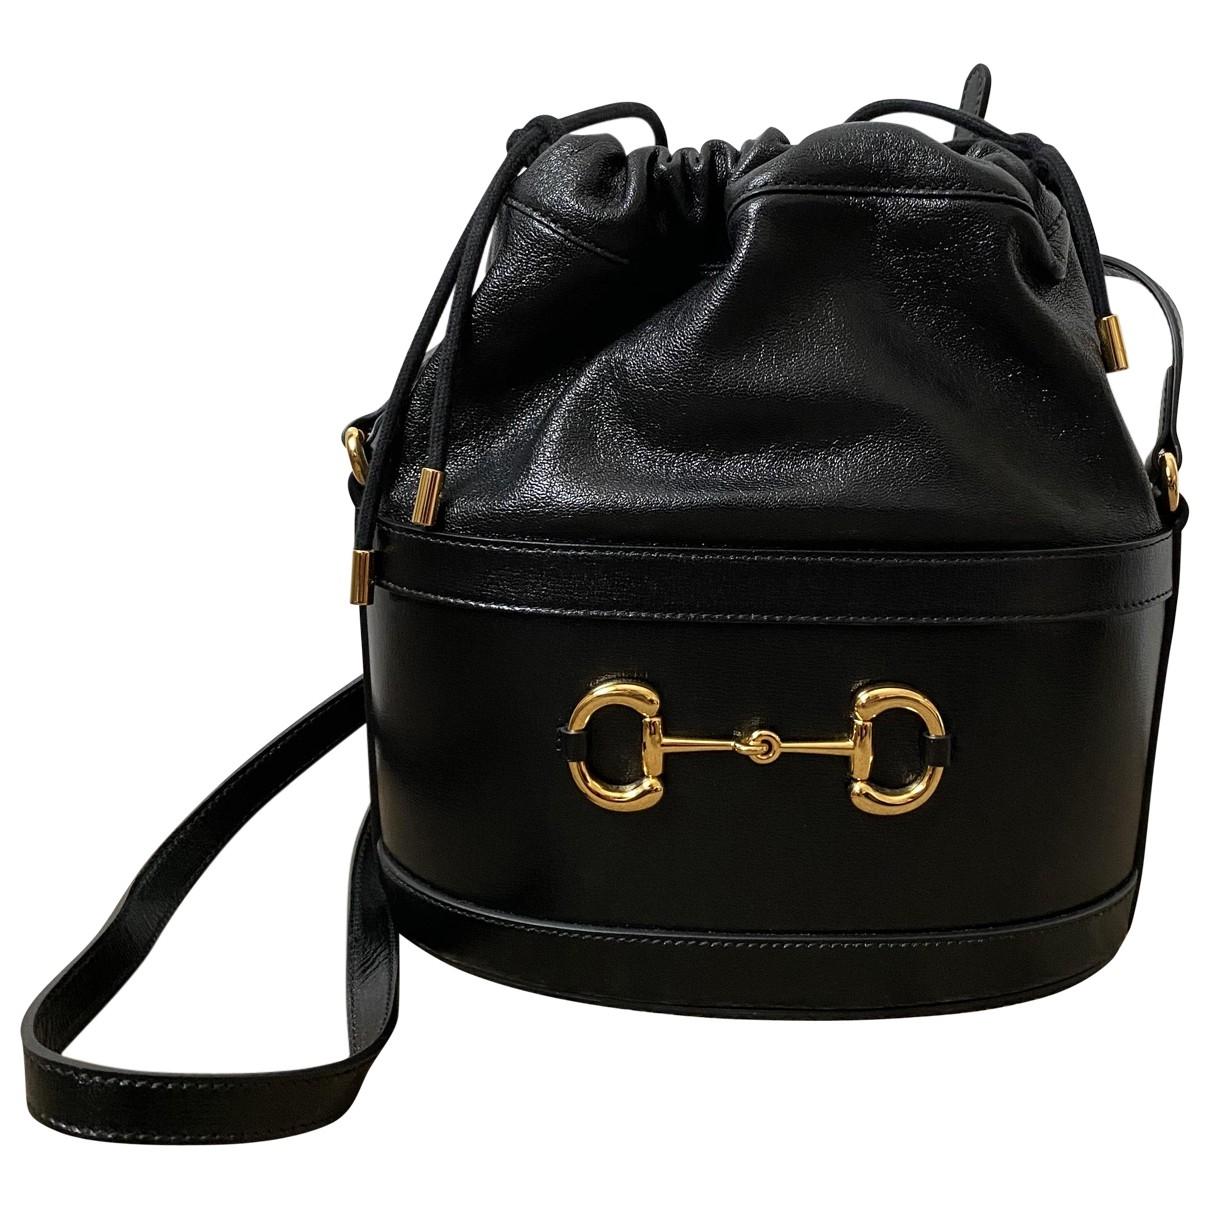 Gucci 1955 Black Leather handbag for Women \N